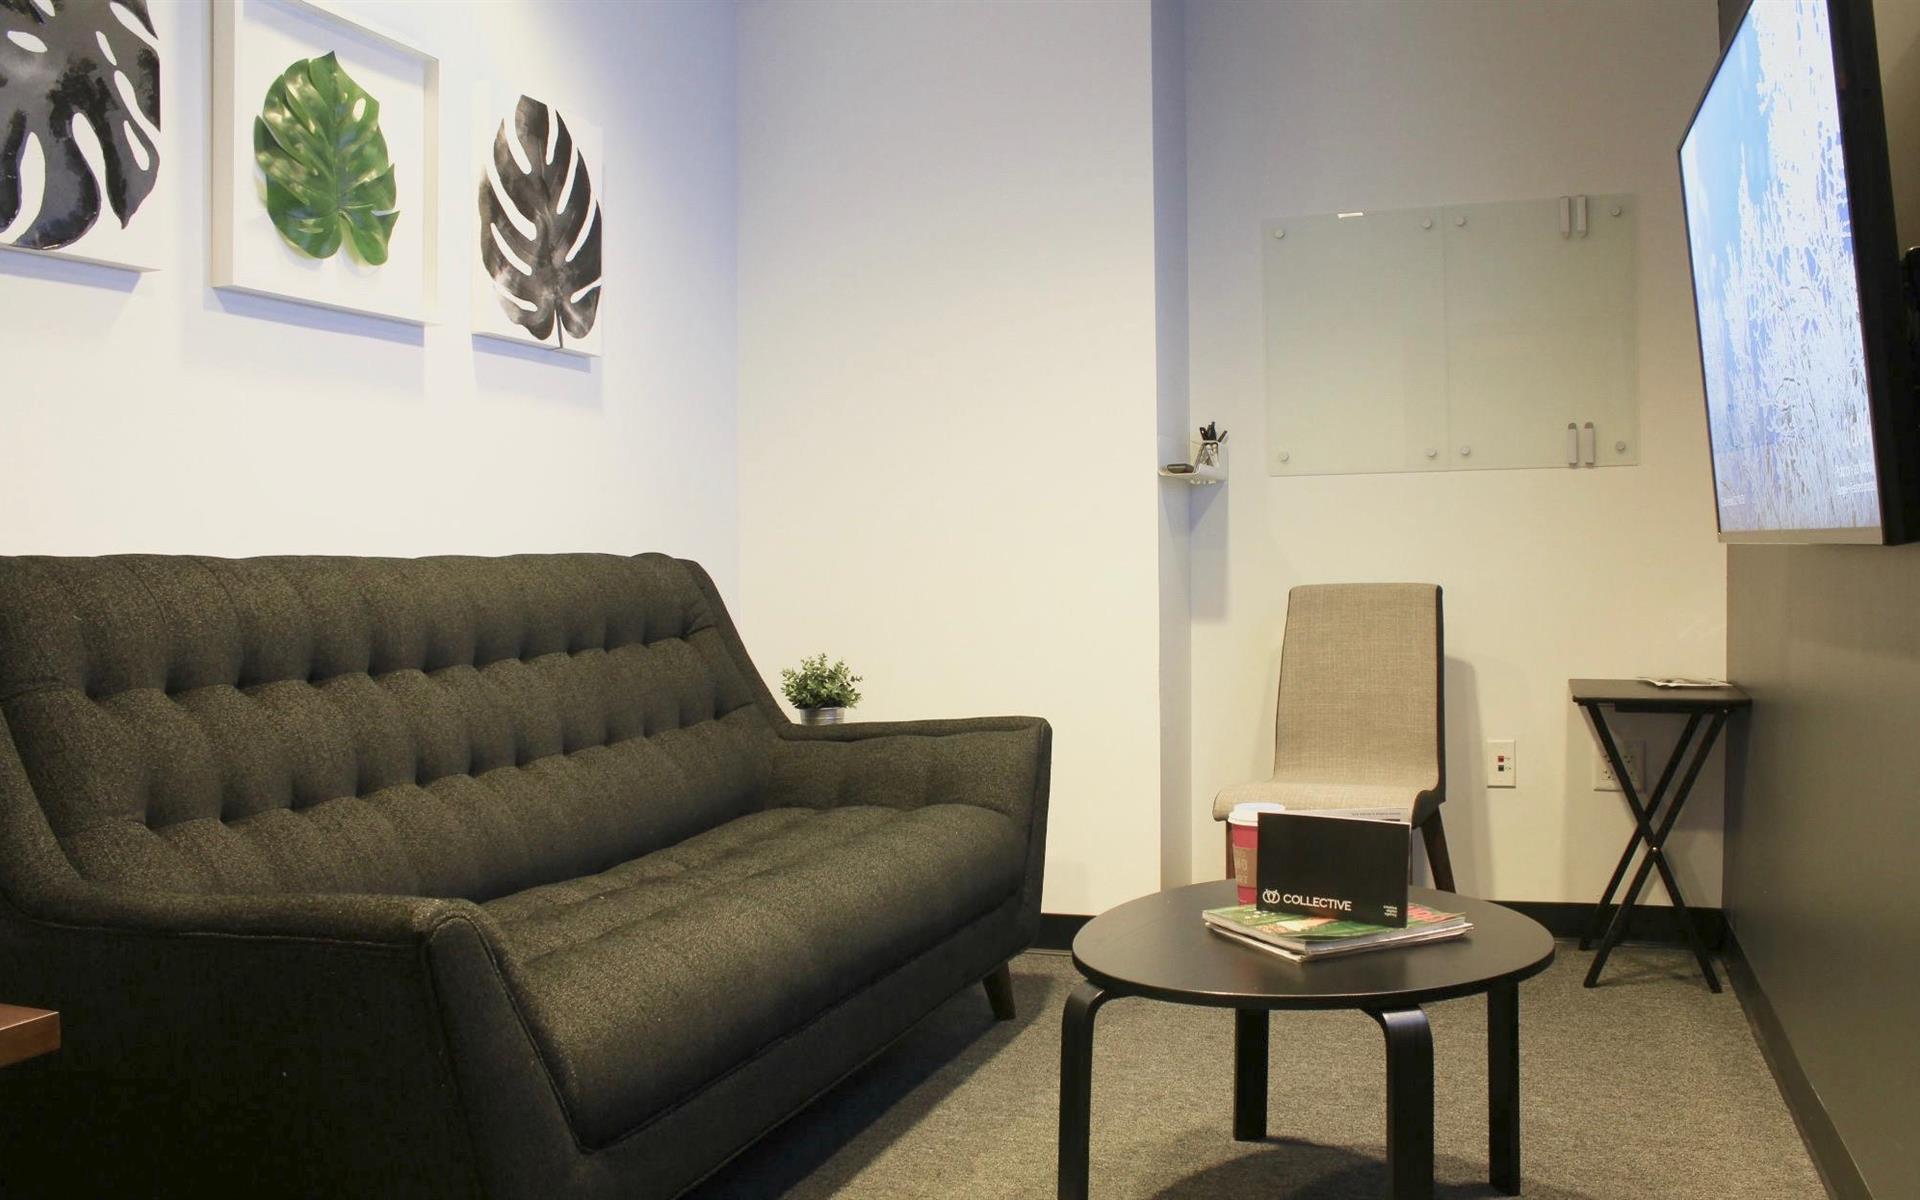 Collective Ventures - Study Room